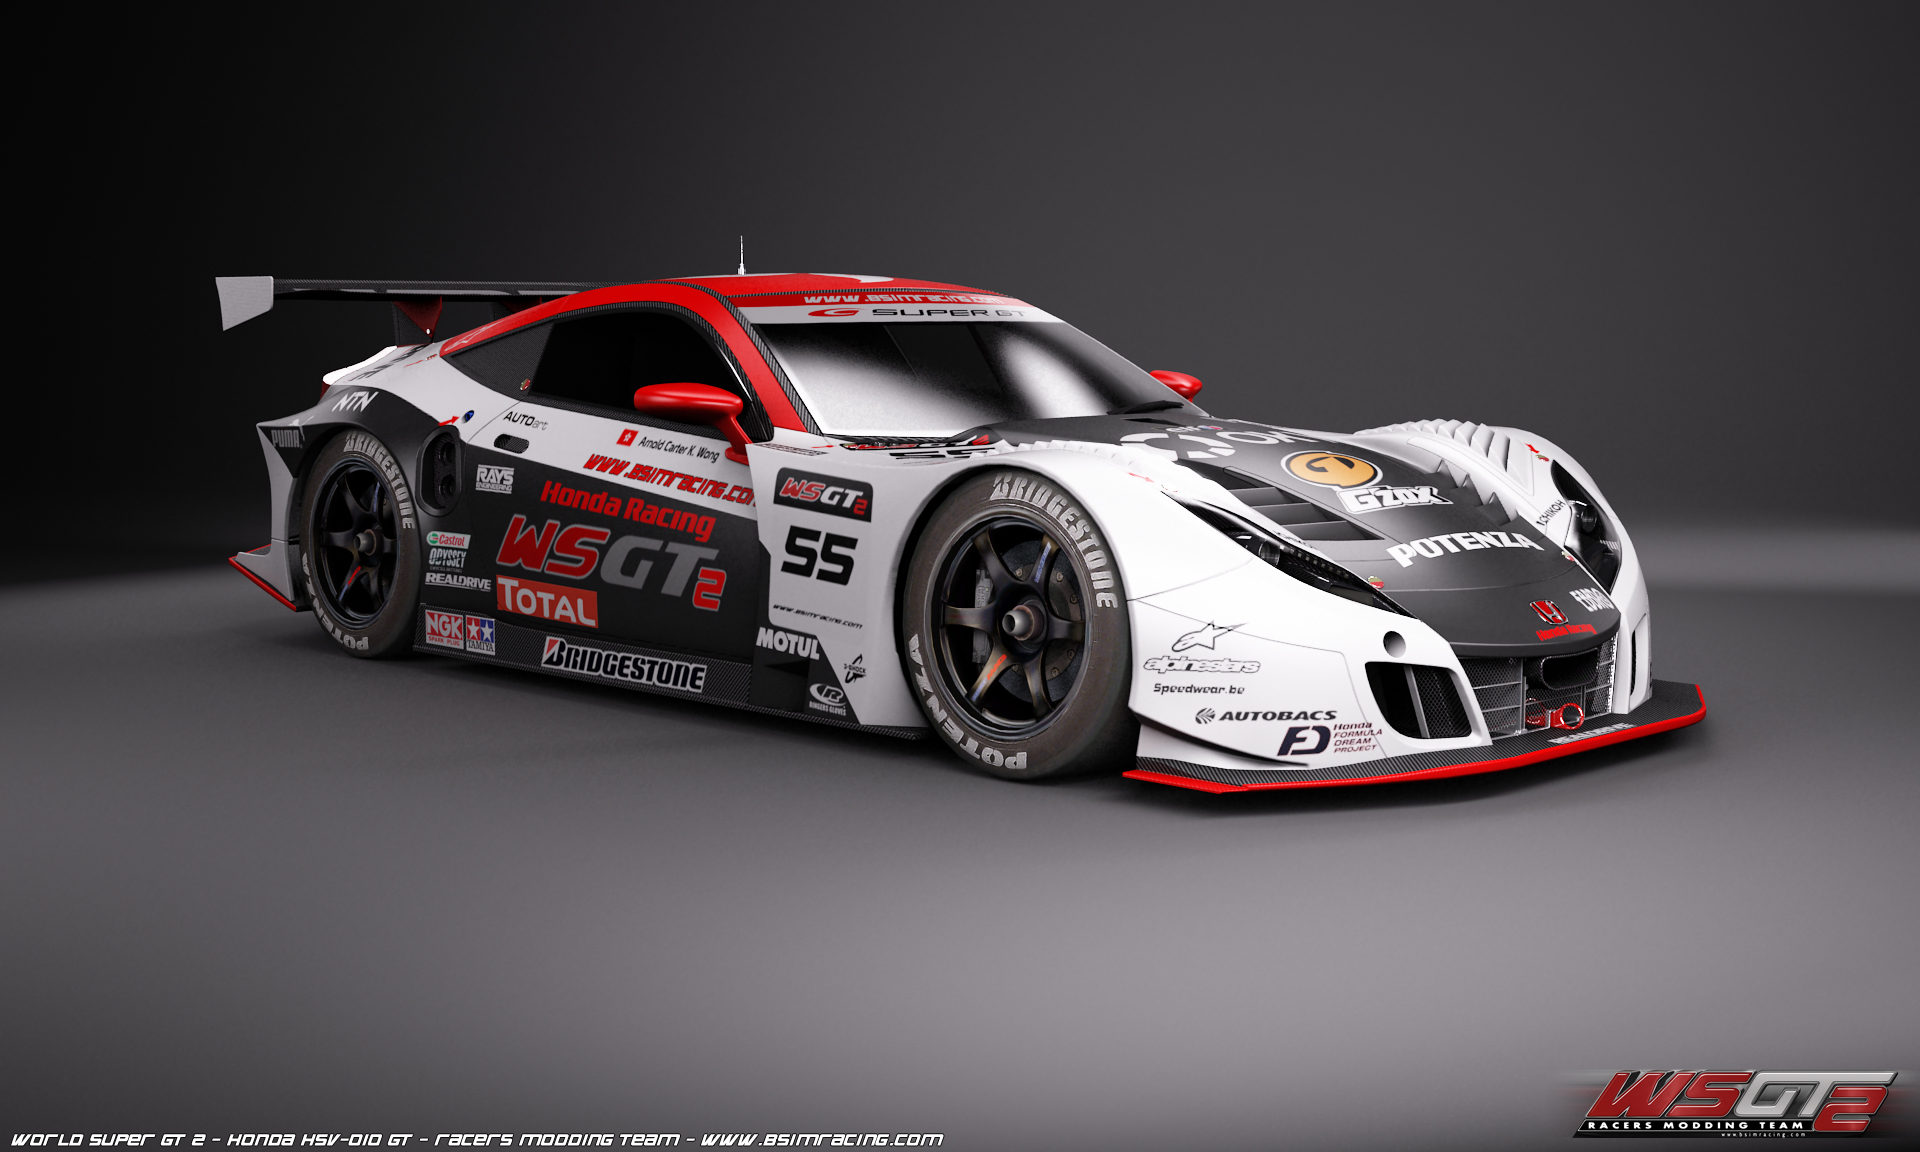 Ordinaire World Super Gt 2 First Honda Hsv 010 In Game Previews Virtualr